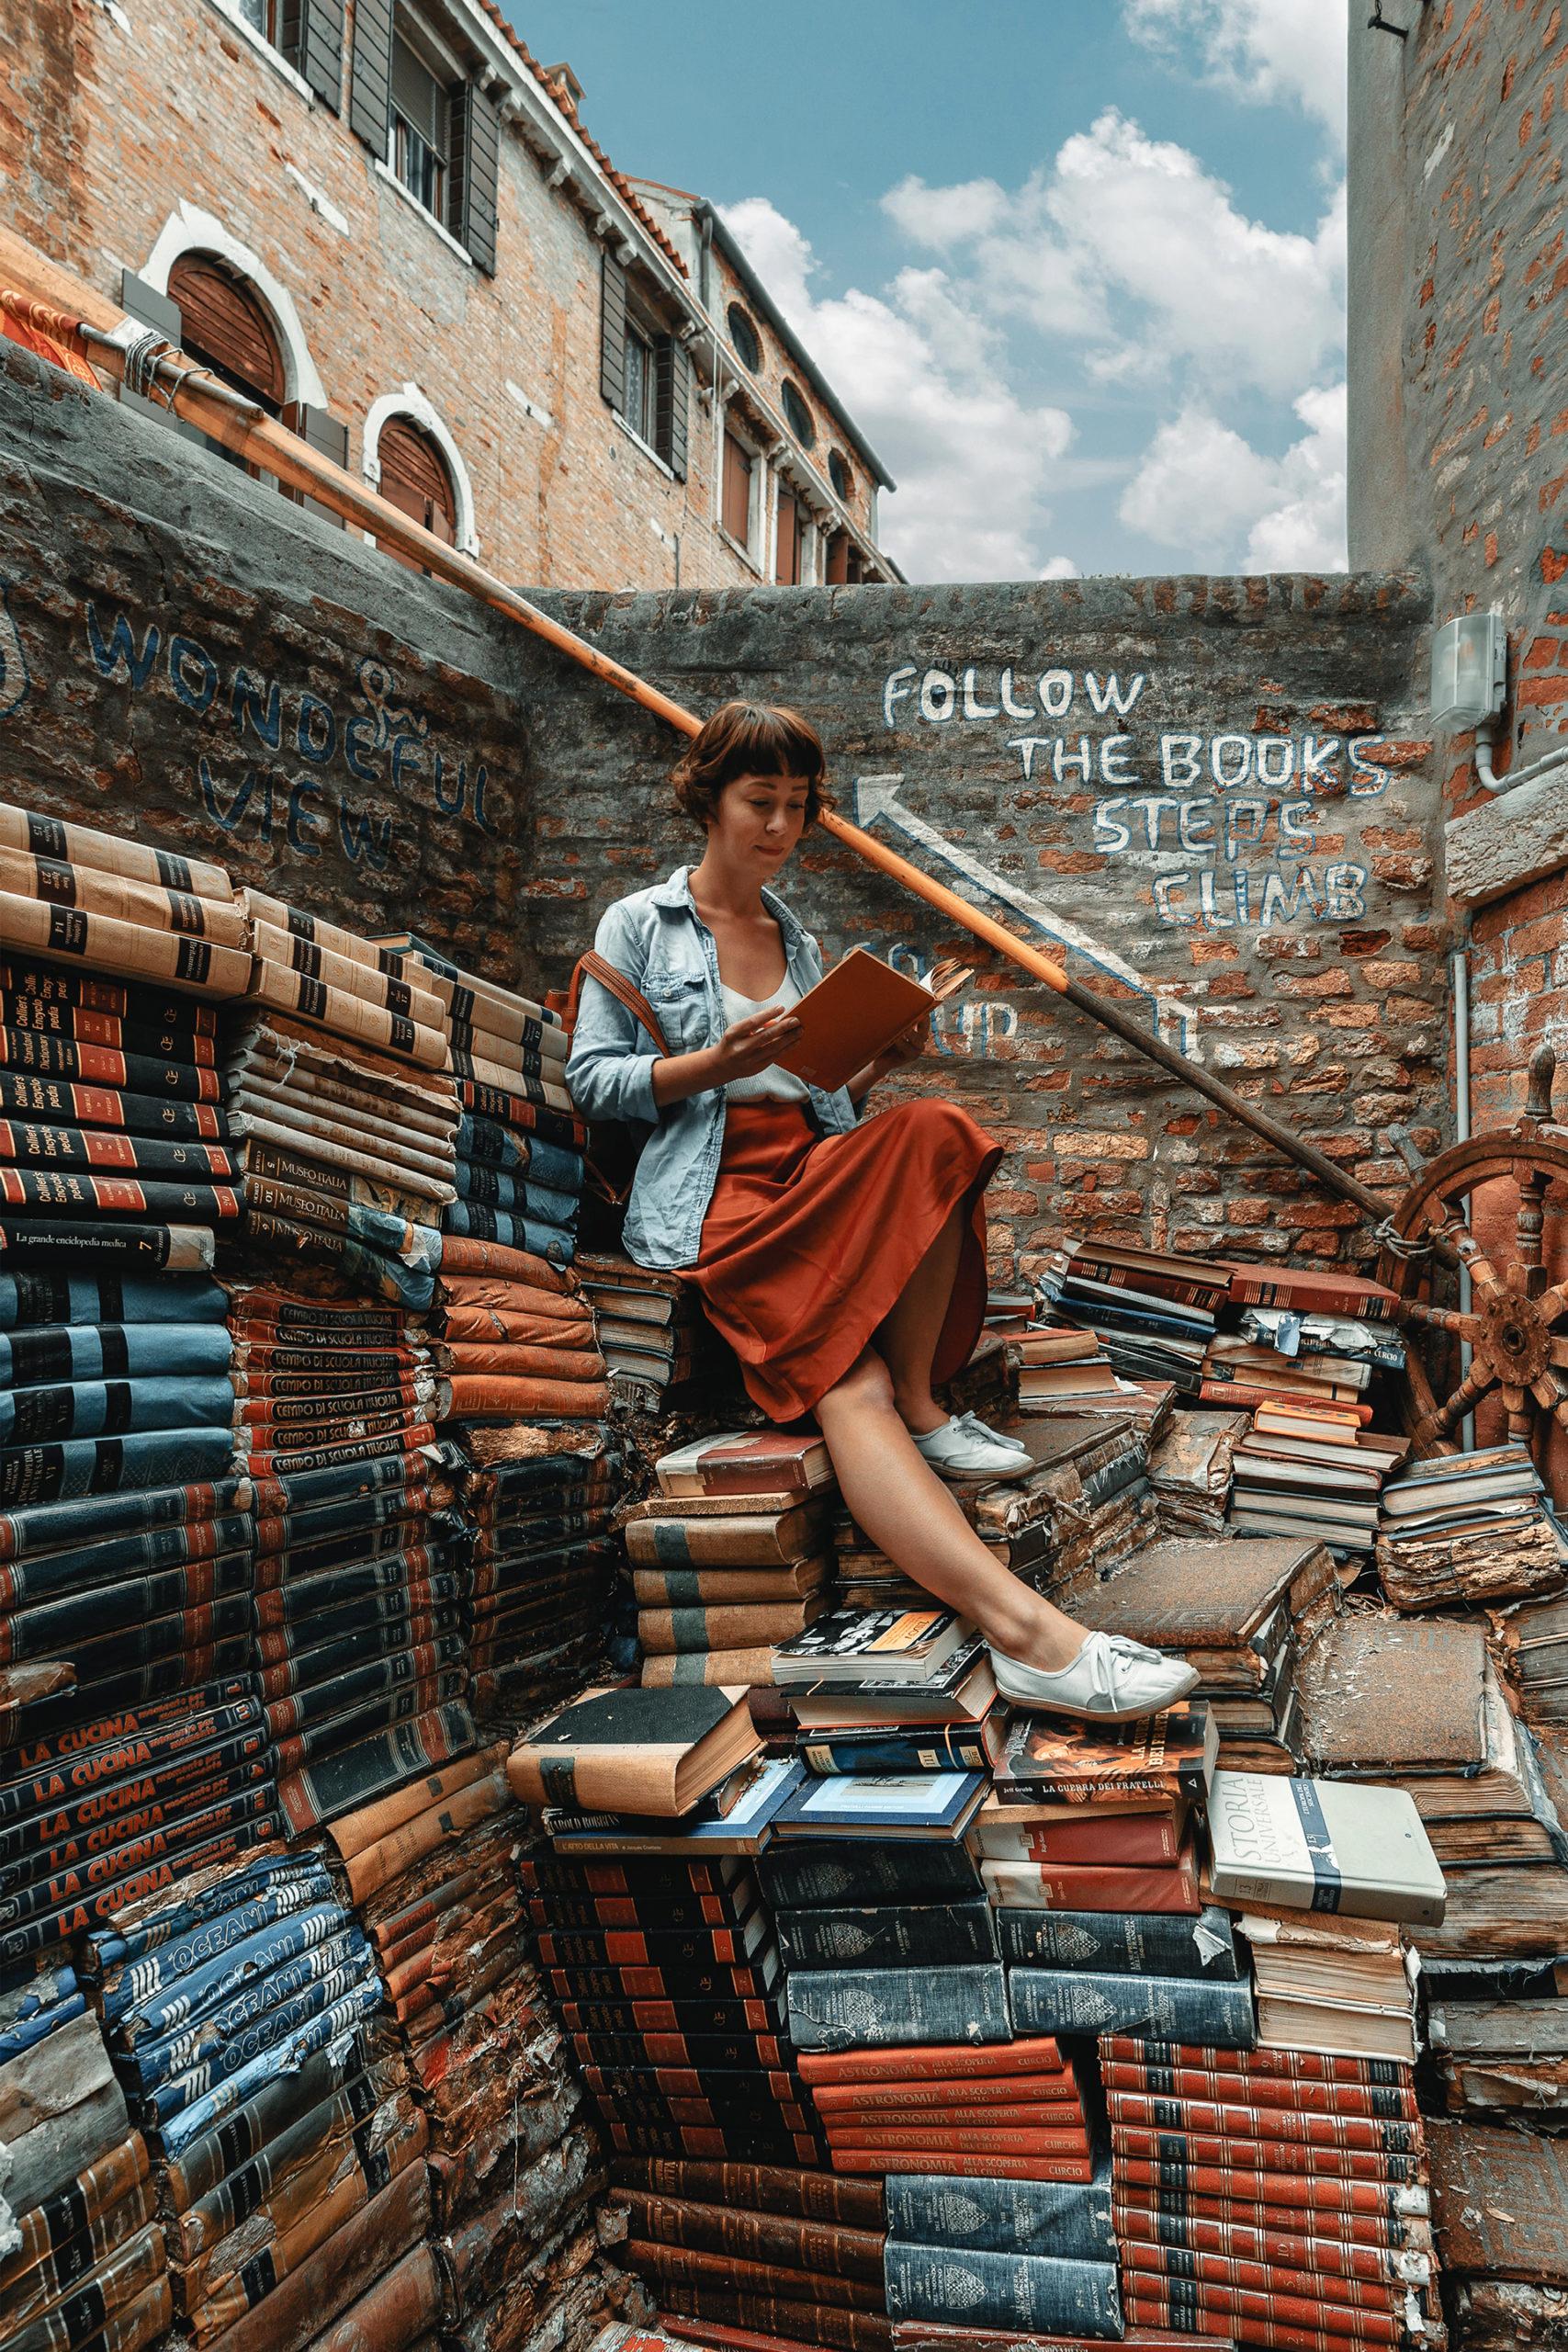 Die »Büchertreppe« der Libreria Acqua Alta in Venedig